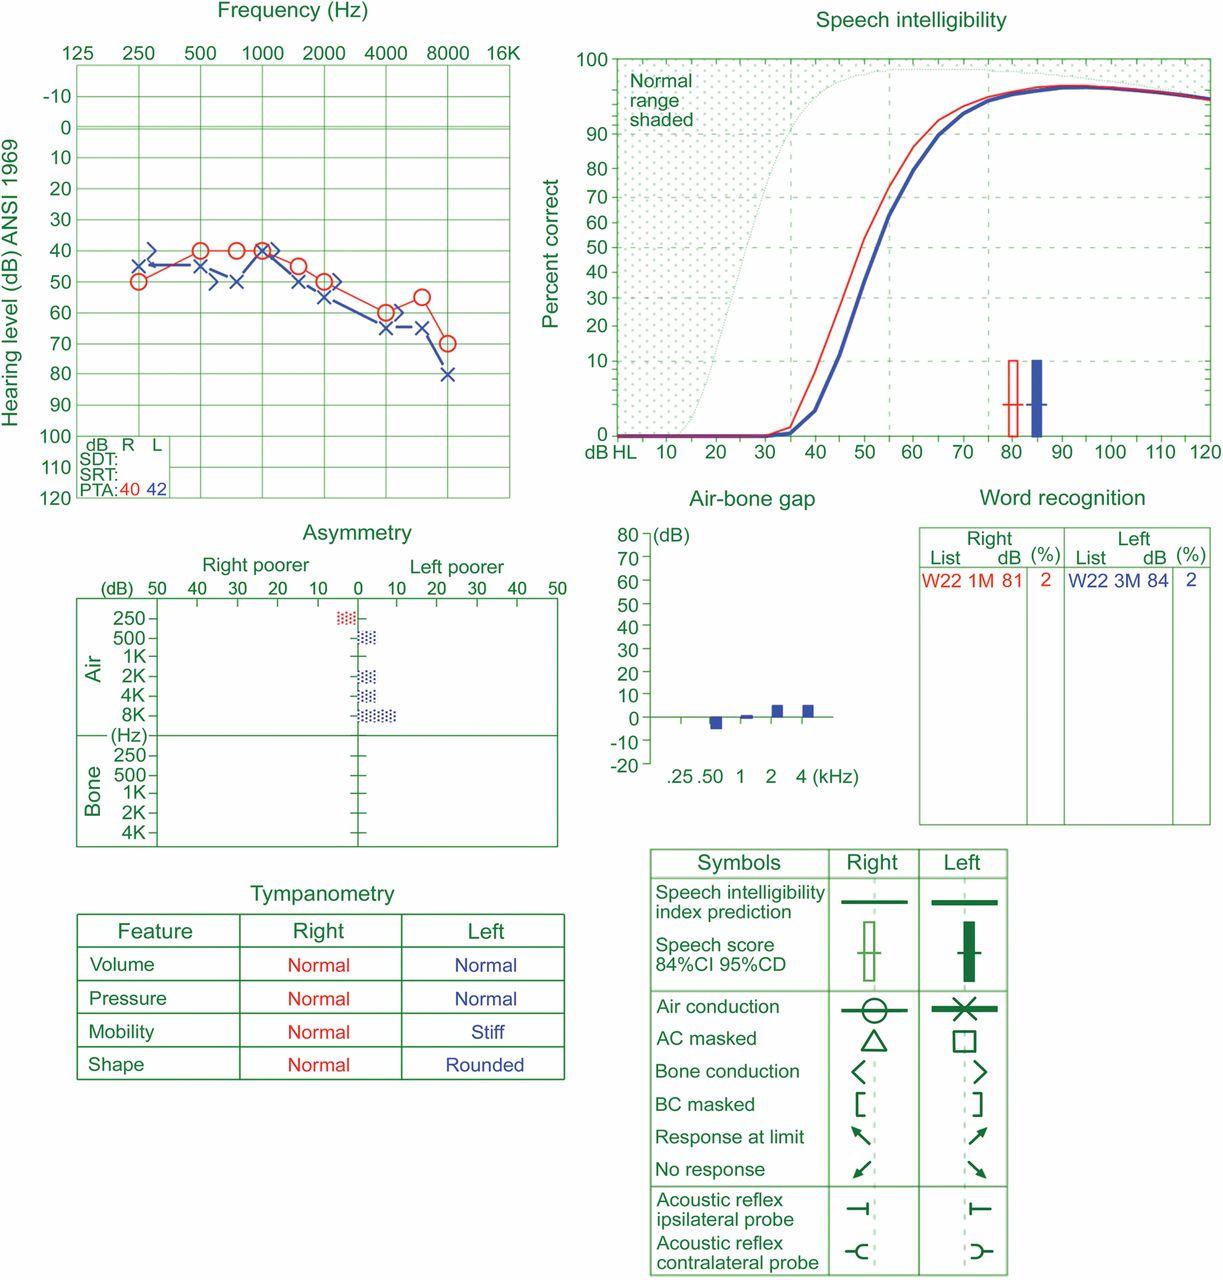 Hearing loss in Wernicke encephalopathy   Neurology Clinical Practice